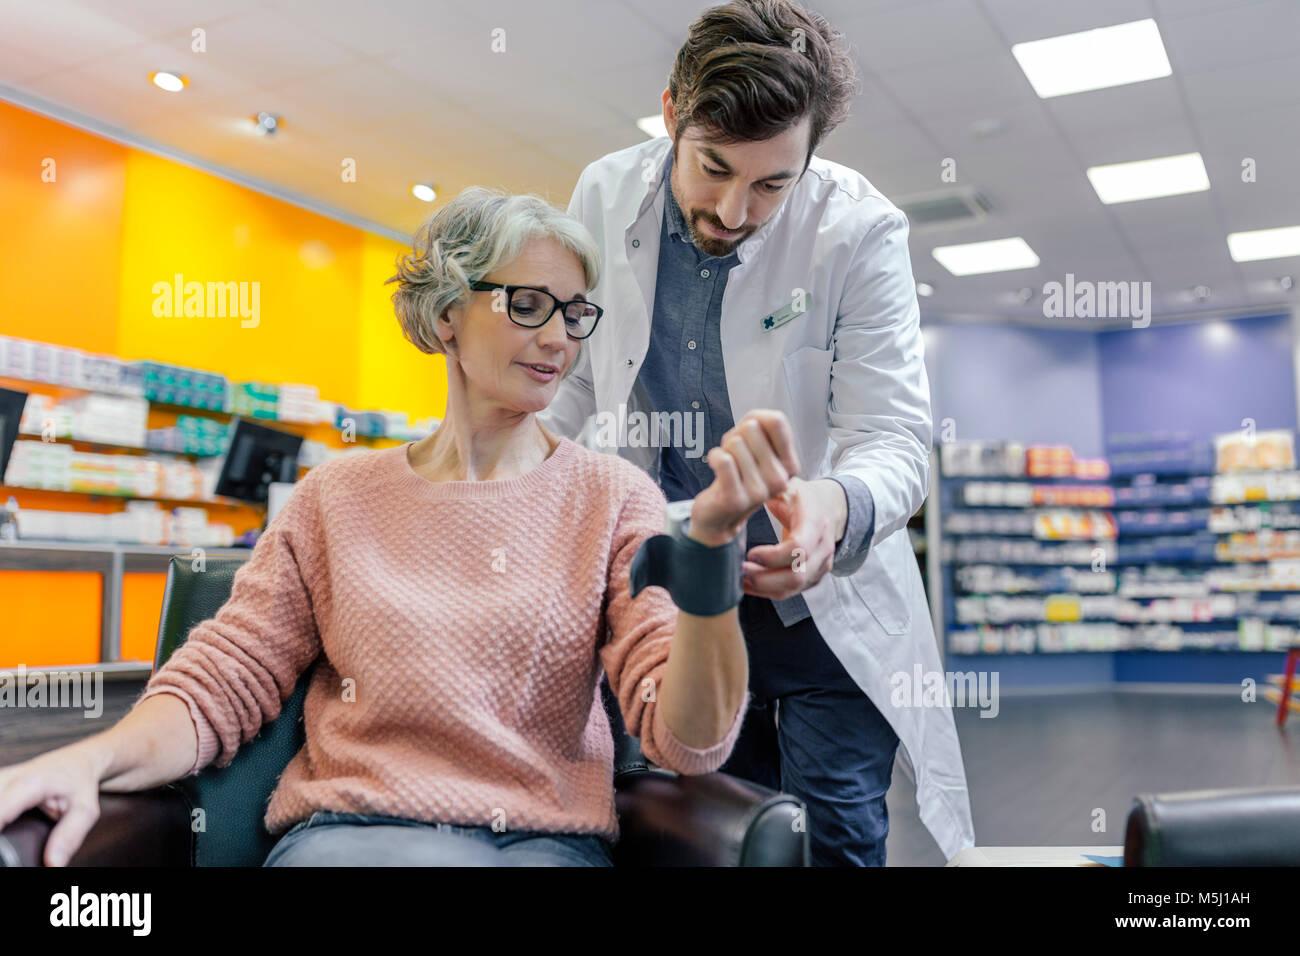 Pharmacist taking blood pressure of customer in pharmacy - Stock Image